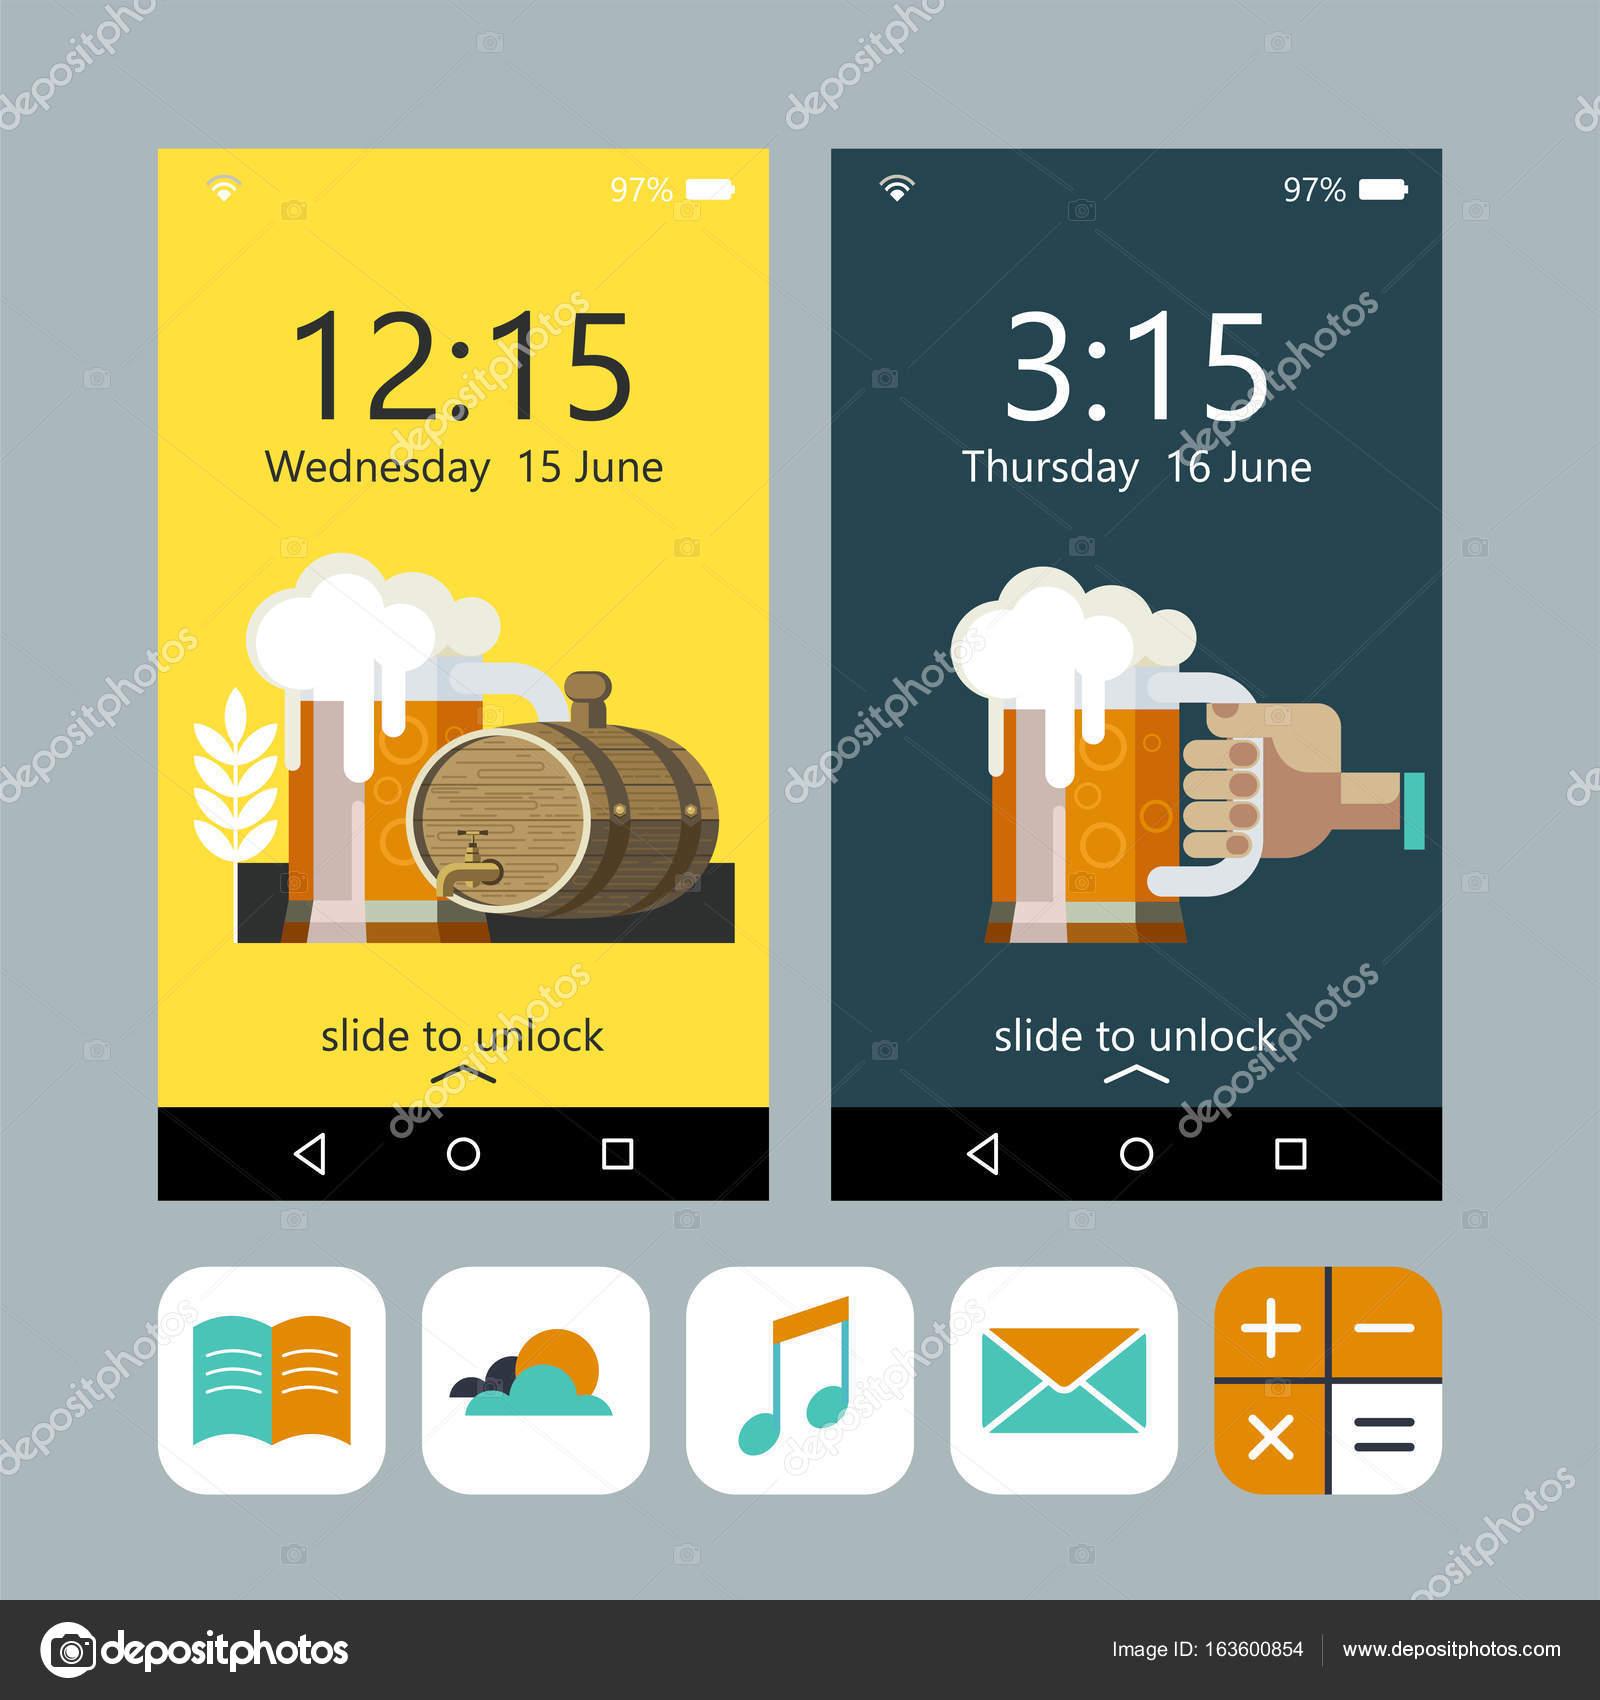 Beer Mug Wallpaper Wallpaper On The Phone A Mug Of Beer